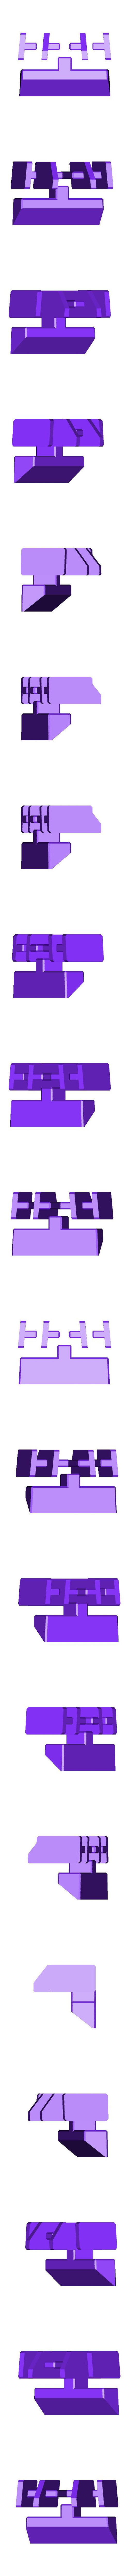 7_Brawn_Backpack2_Glass_LIGHTBLUE.stl Download free STL file G1 Transformers Brawn • 3D printer object, Toymakr3D